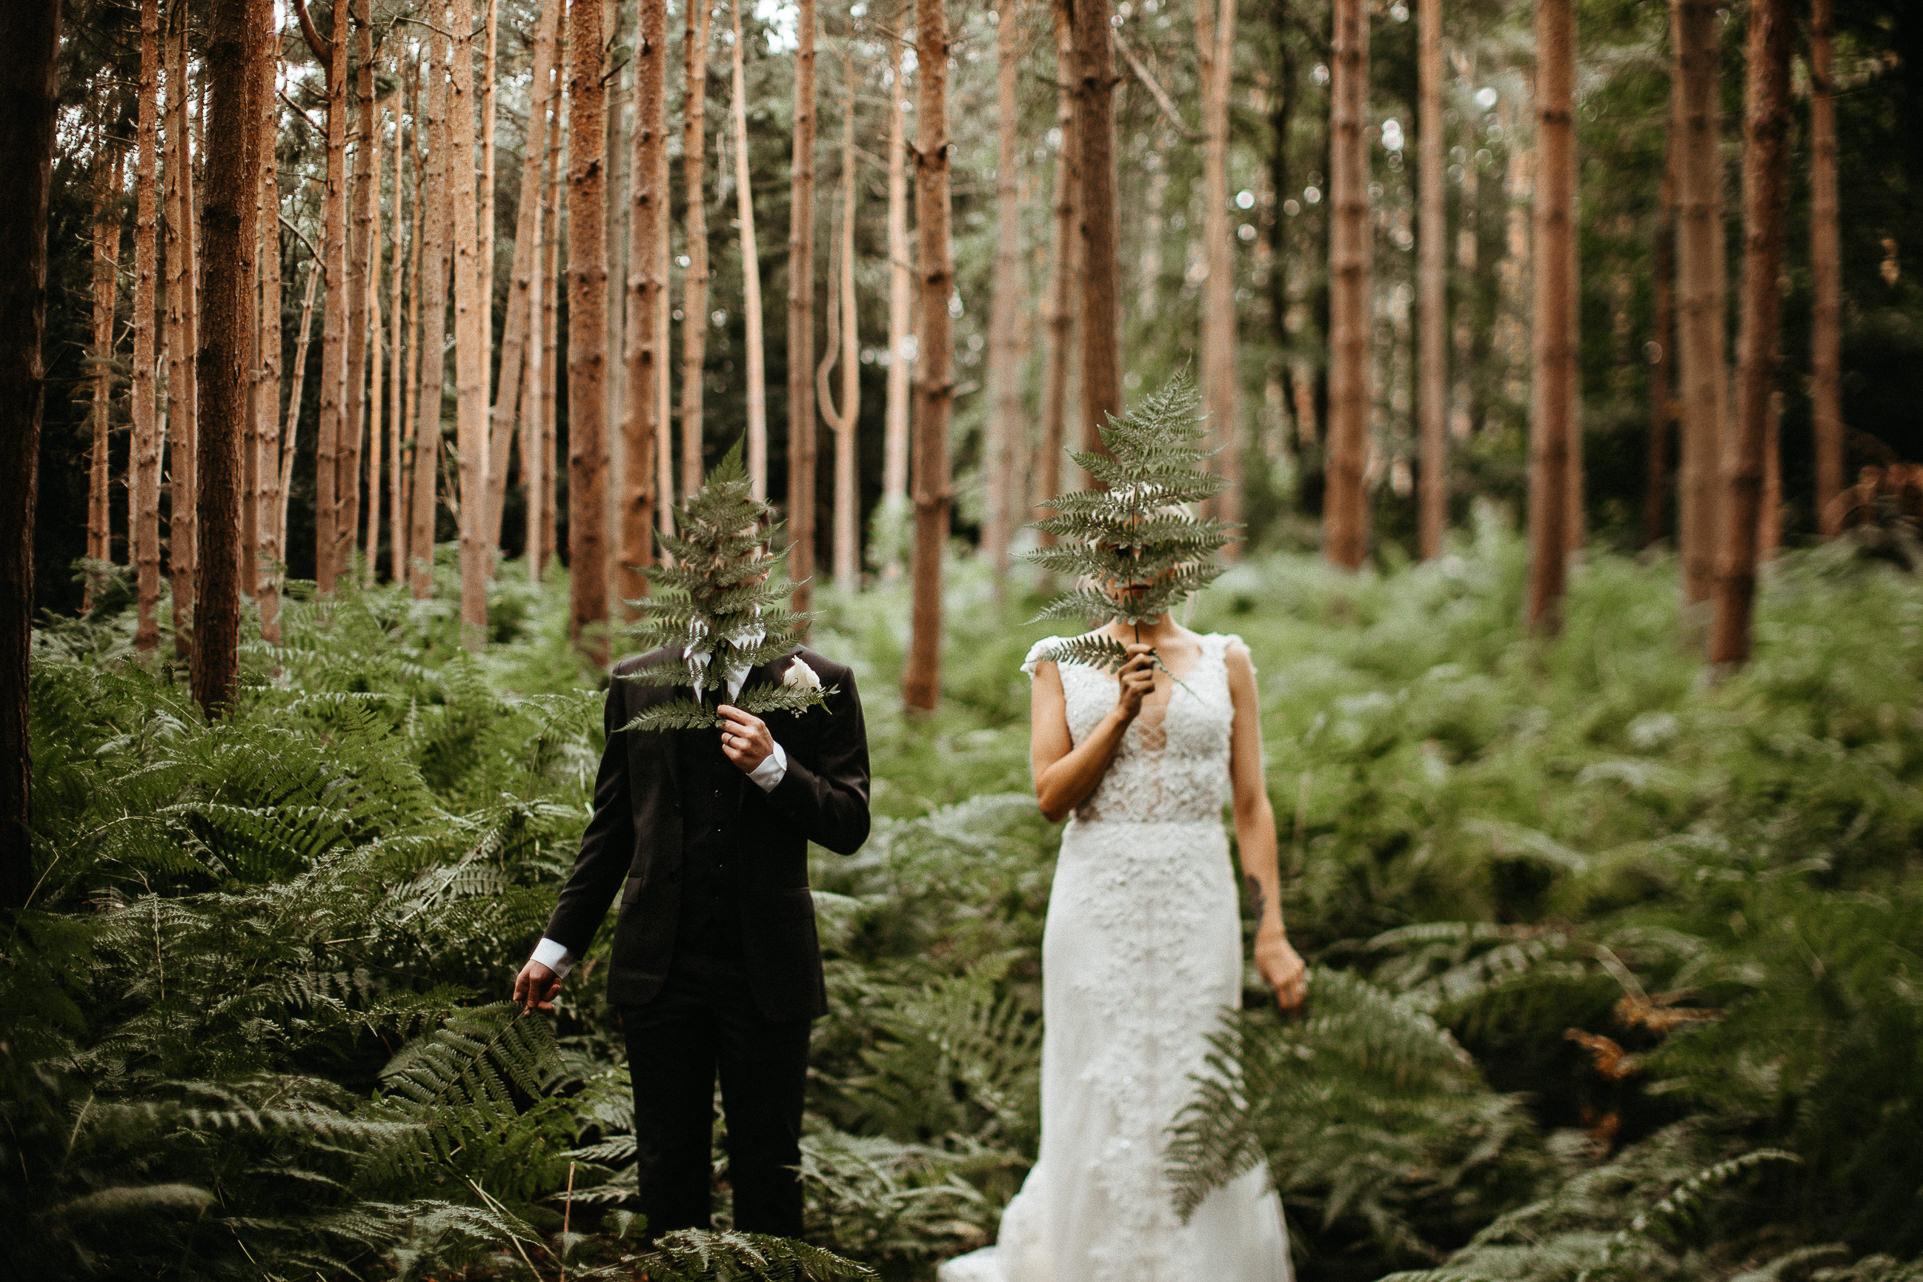 London Wedding Photographer Gione da Silva Lara Jade.jpg